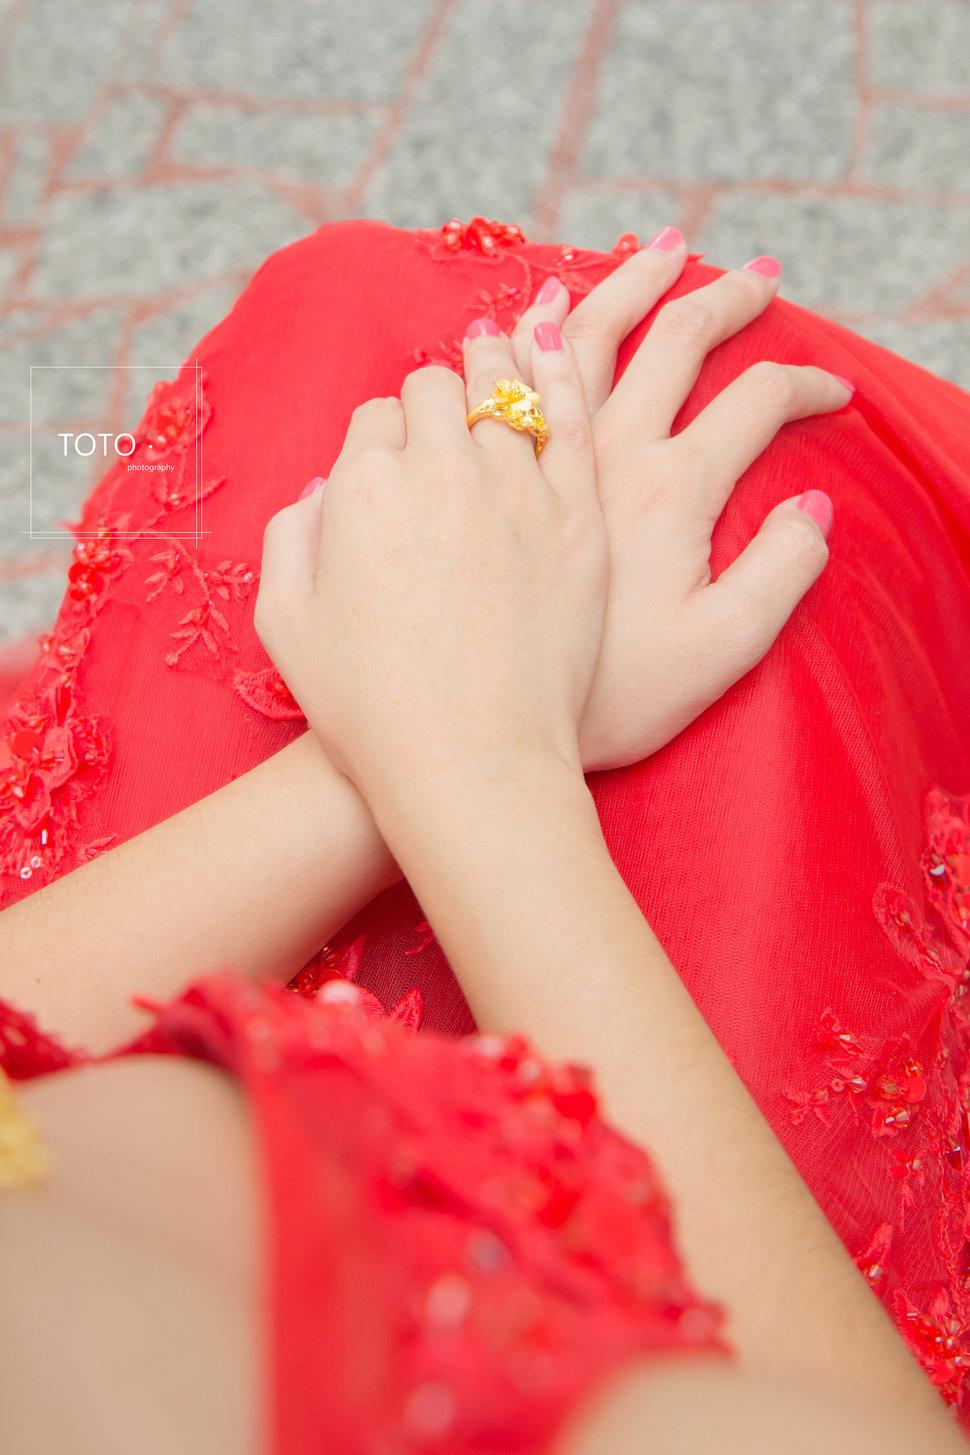 5K0B2526 - TOTO_Photo - 結婚吧